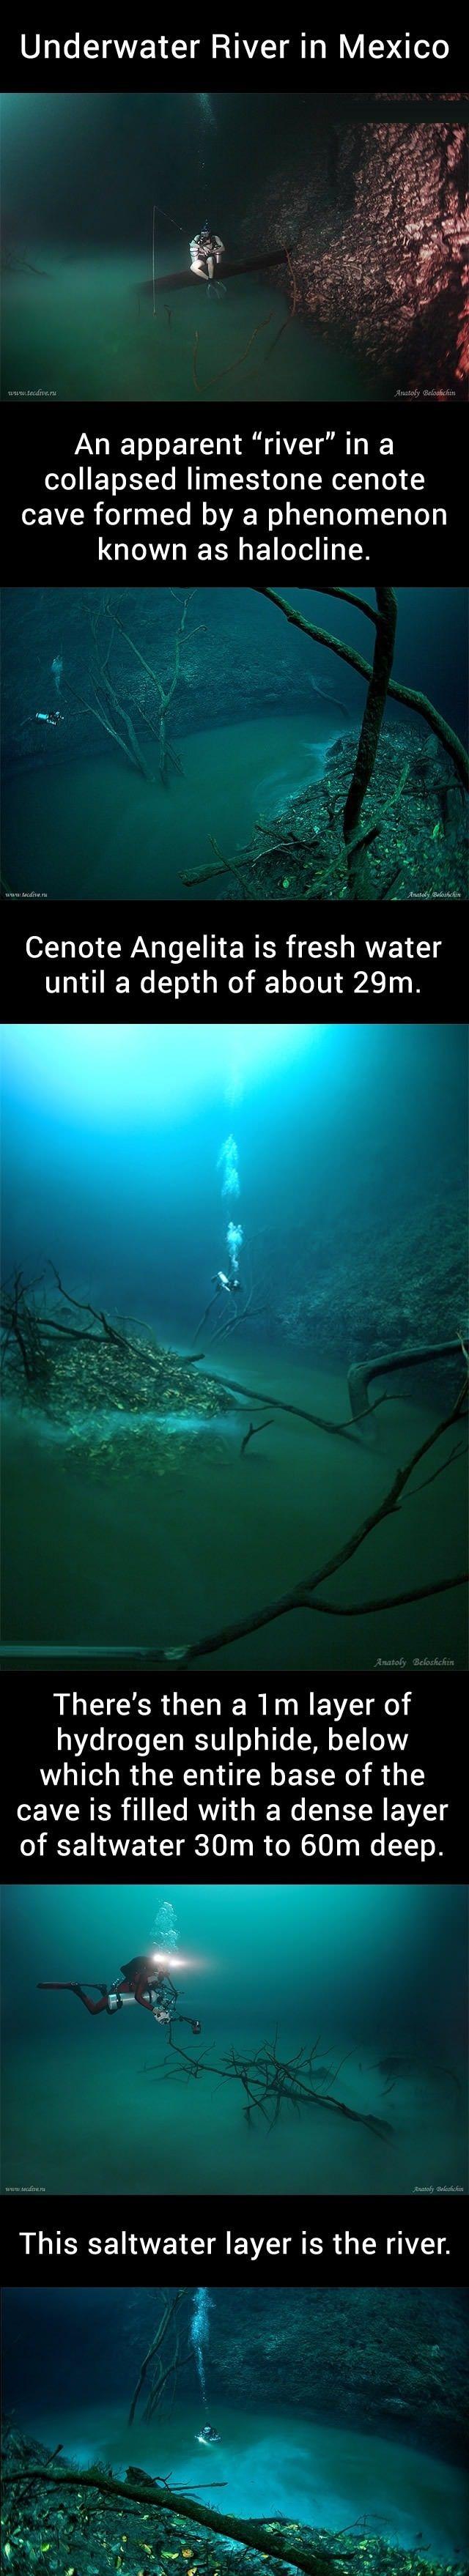 Underwater river, Mexico